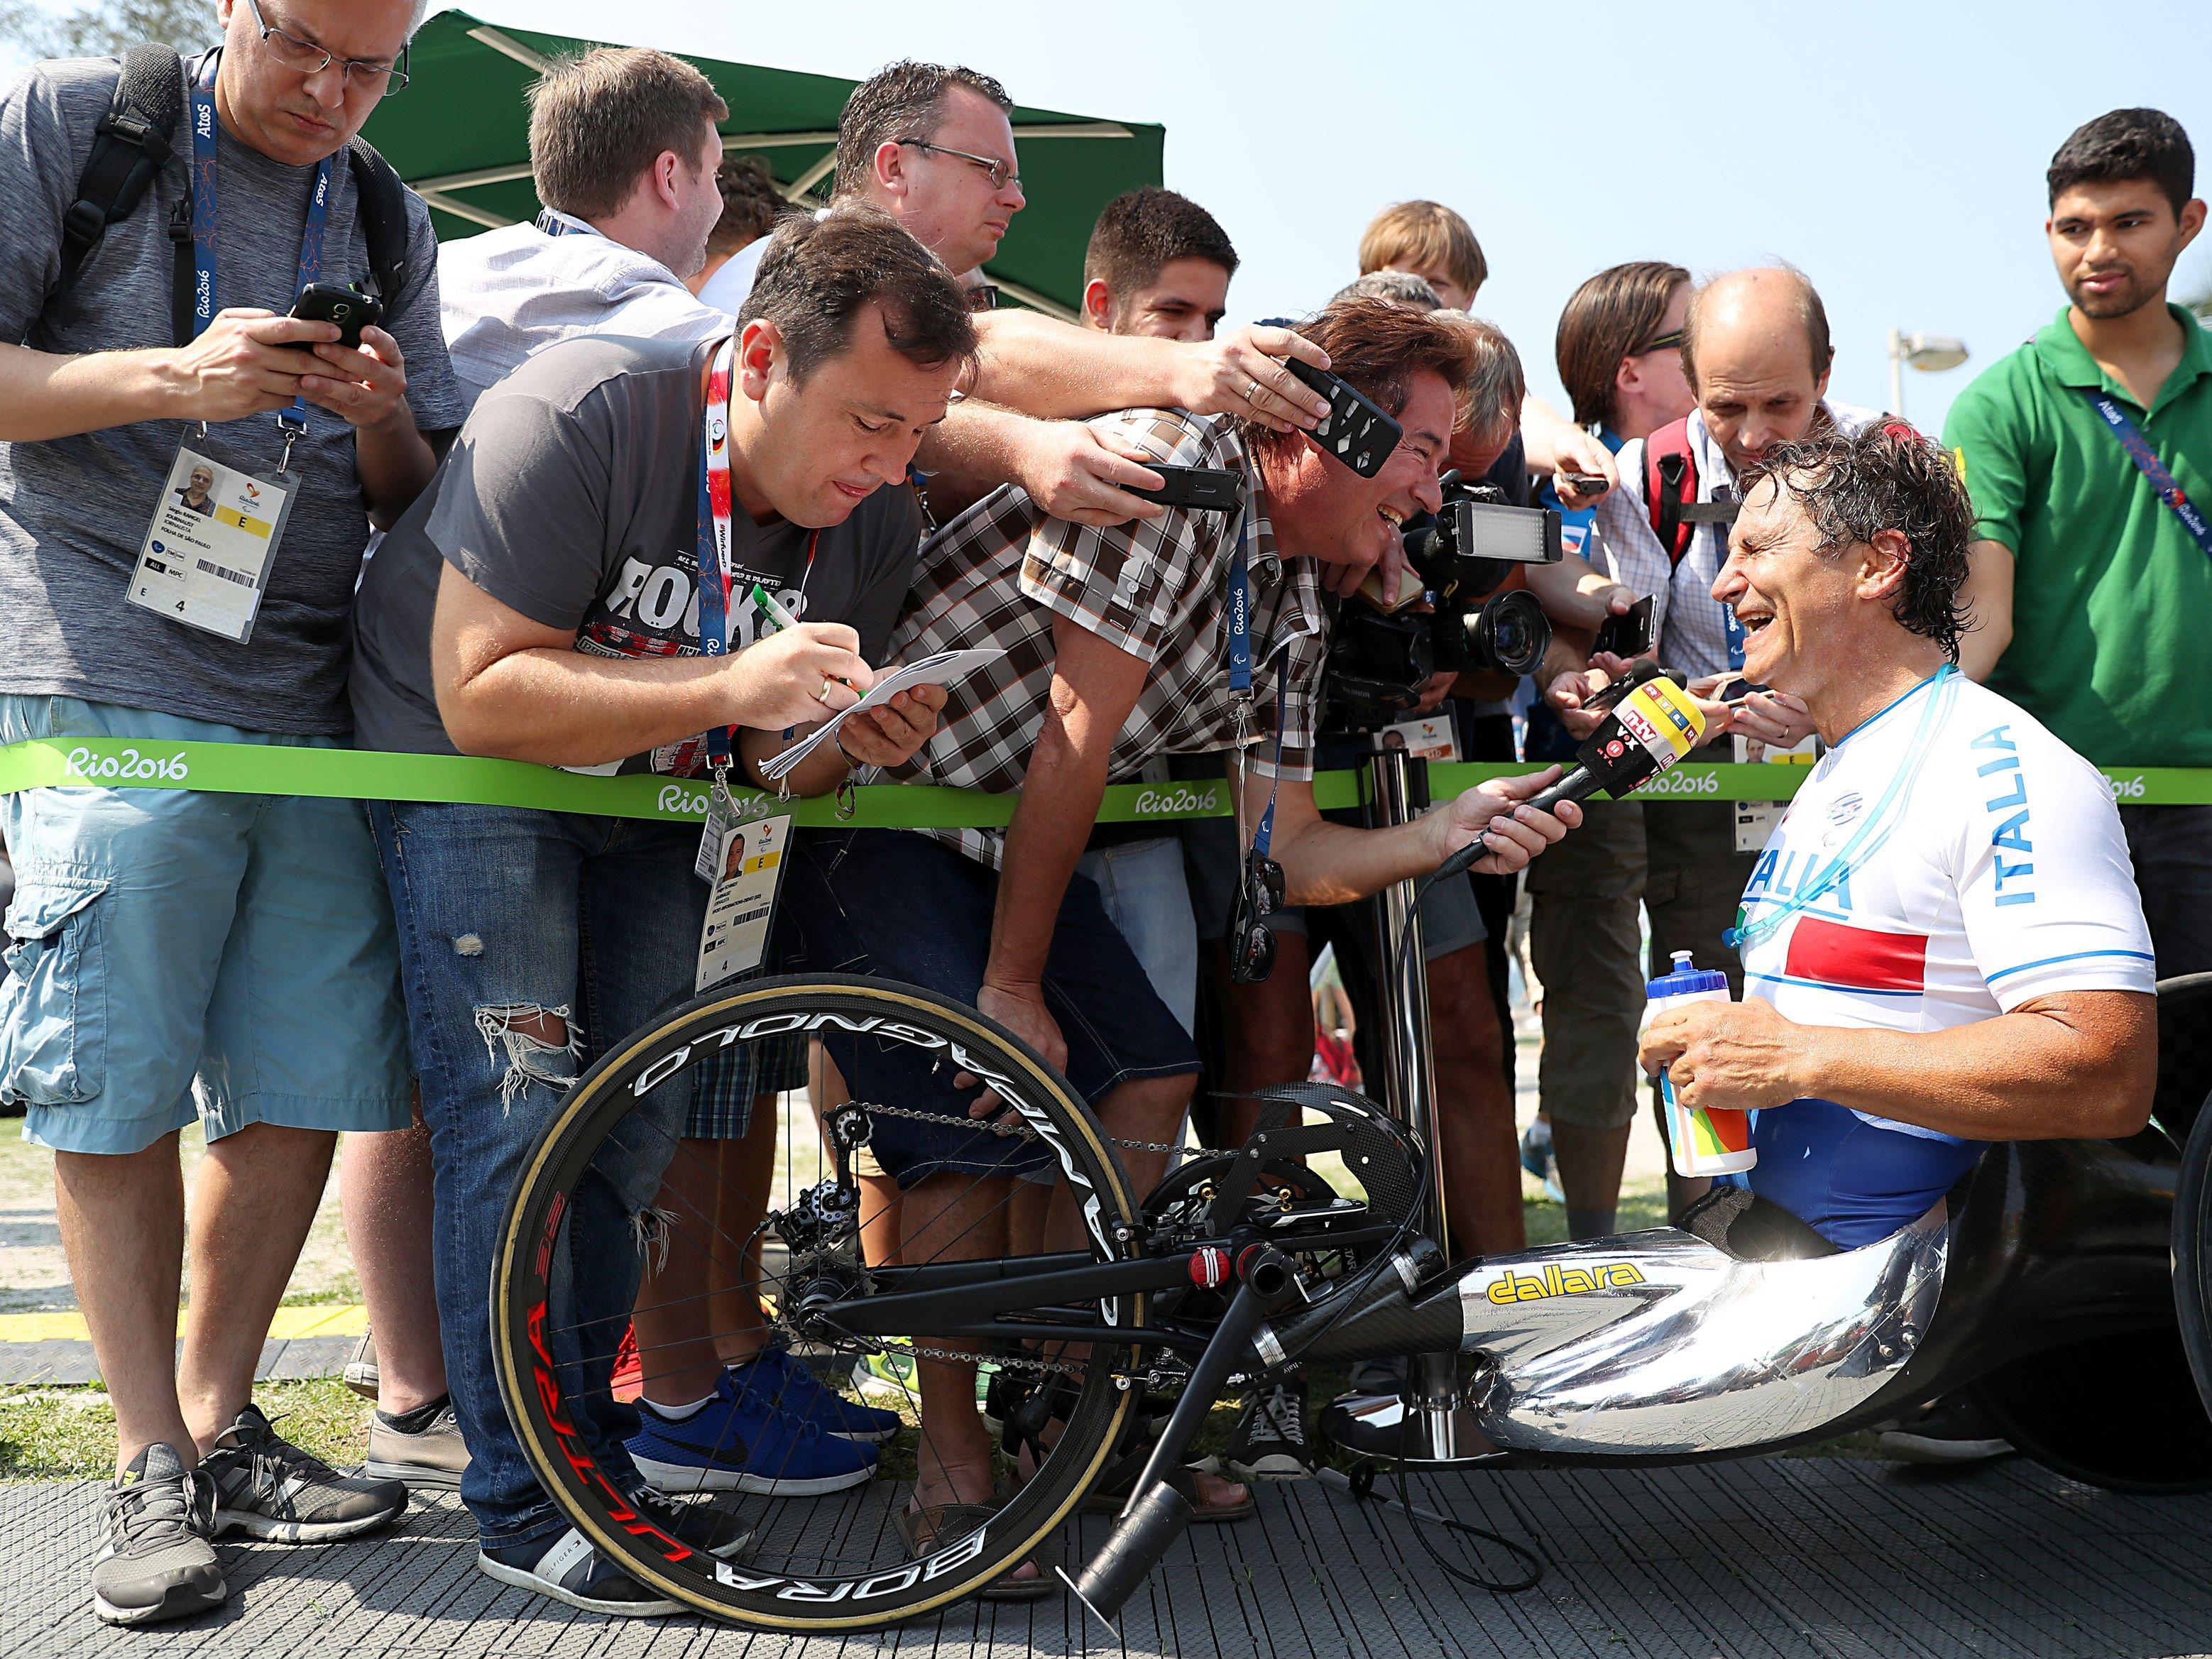 Alex Zanardi nach dem Gewinn seiner dritten Goldmedaille bei Paralympics.